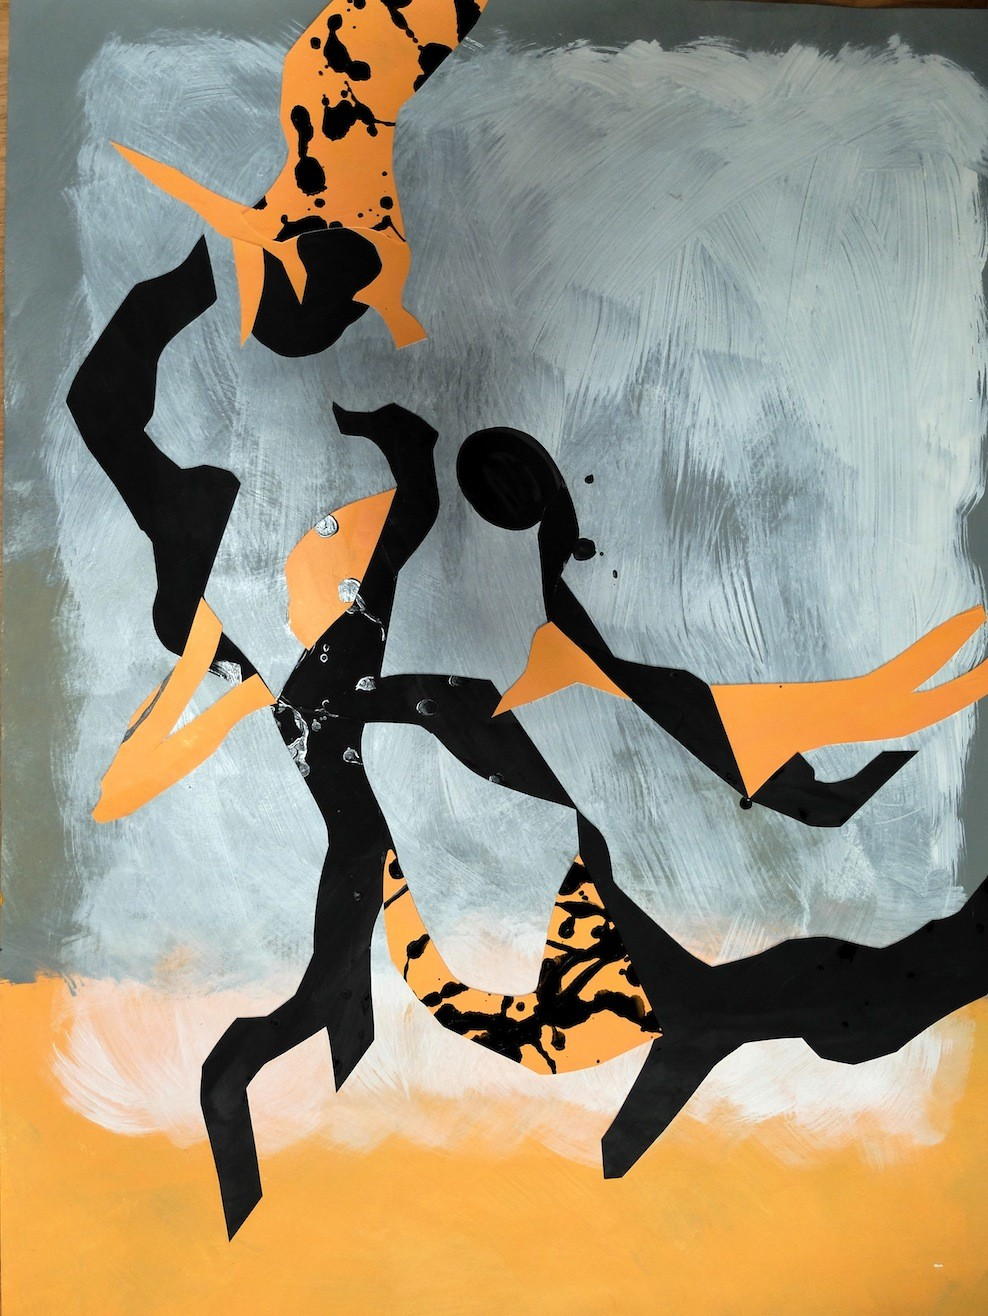 Enfants africains jouant